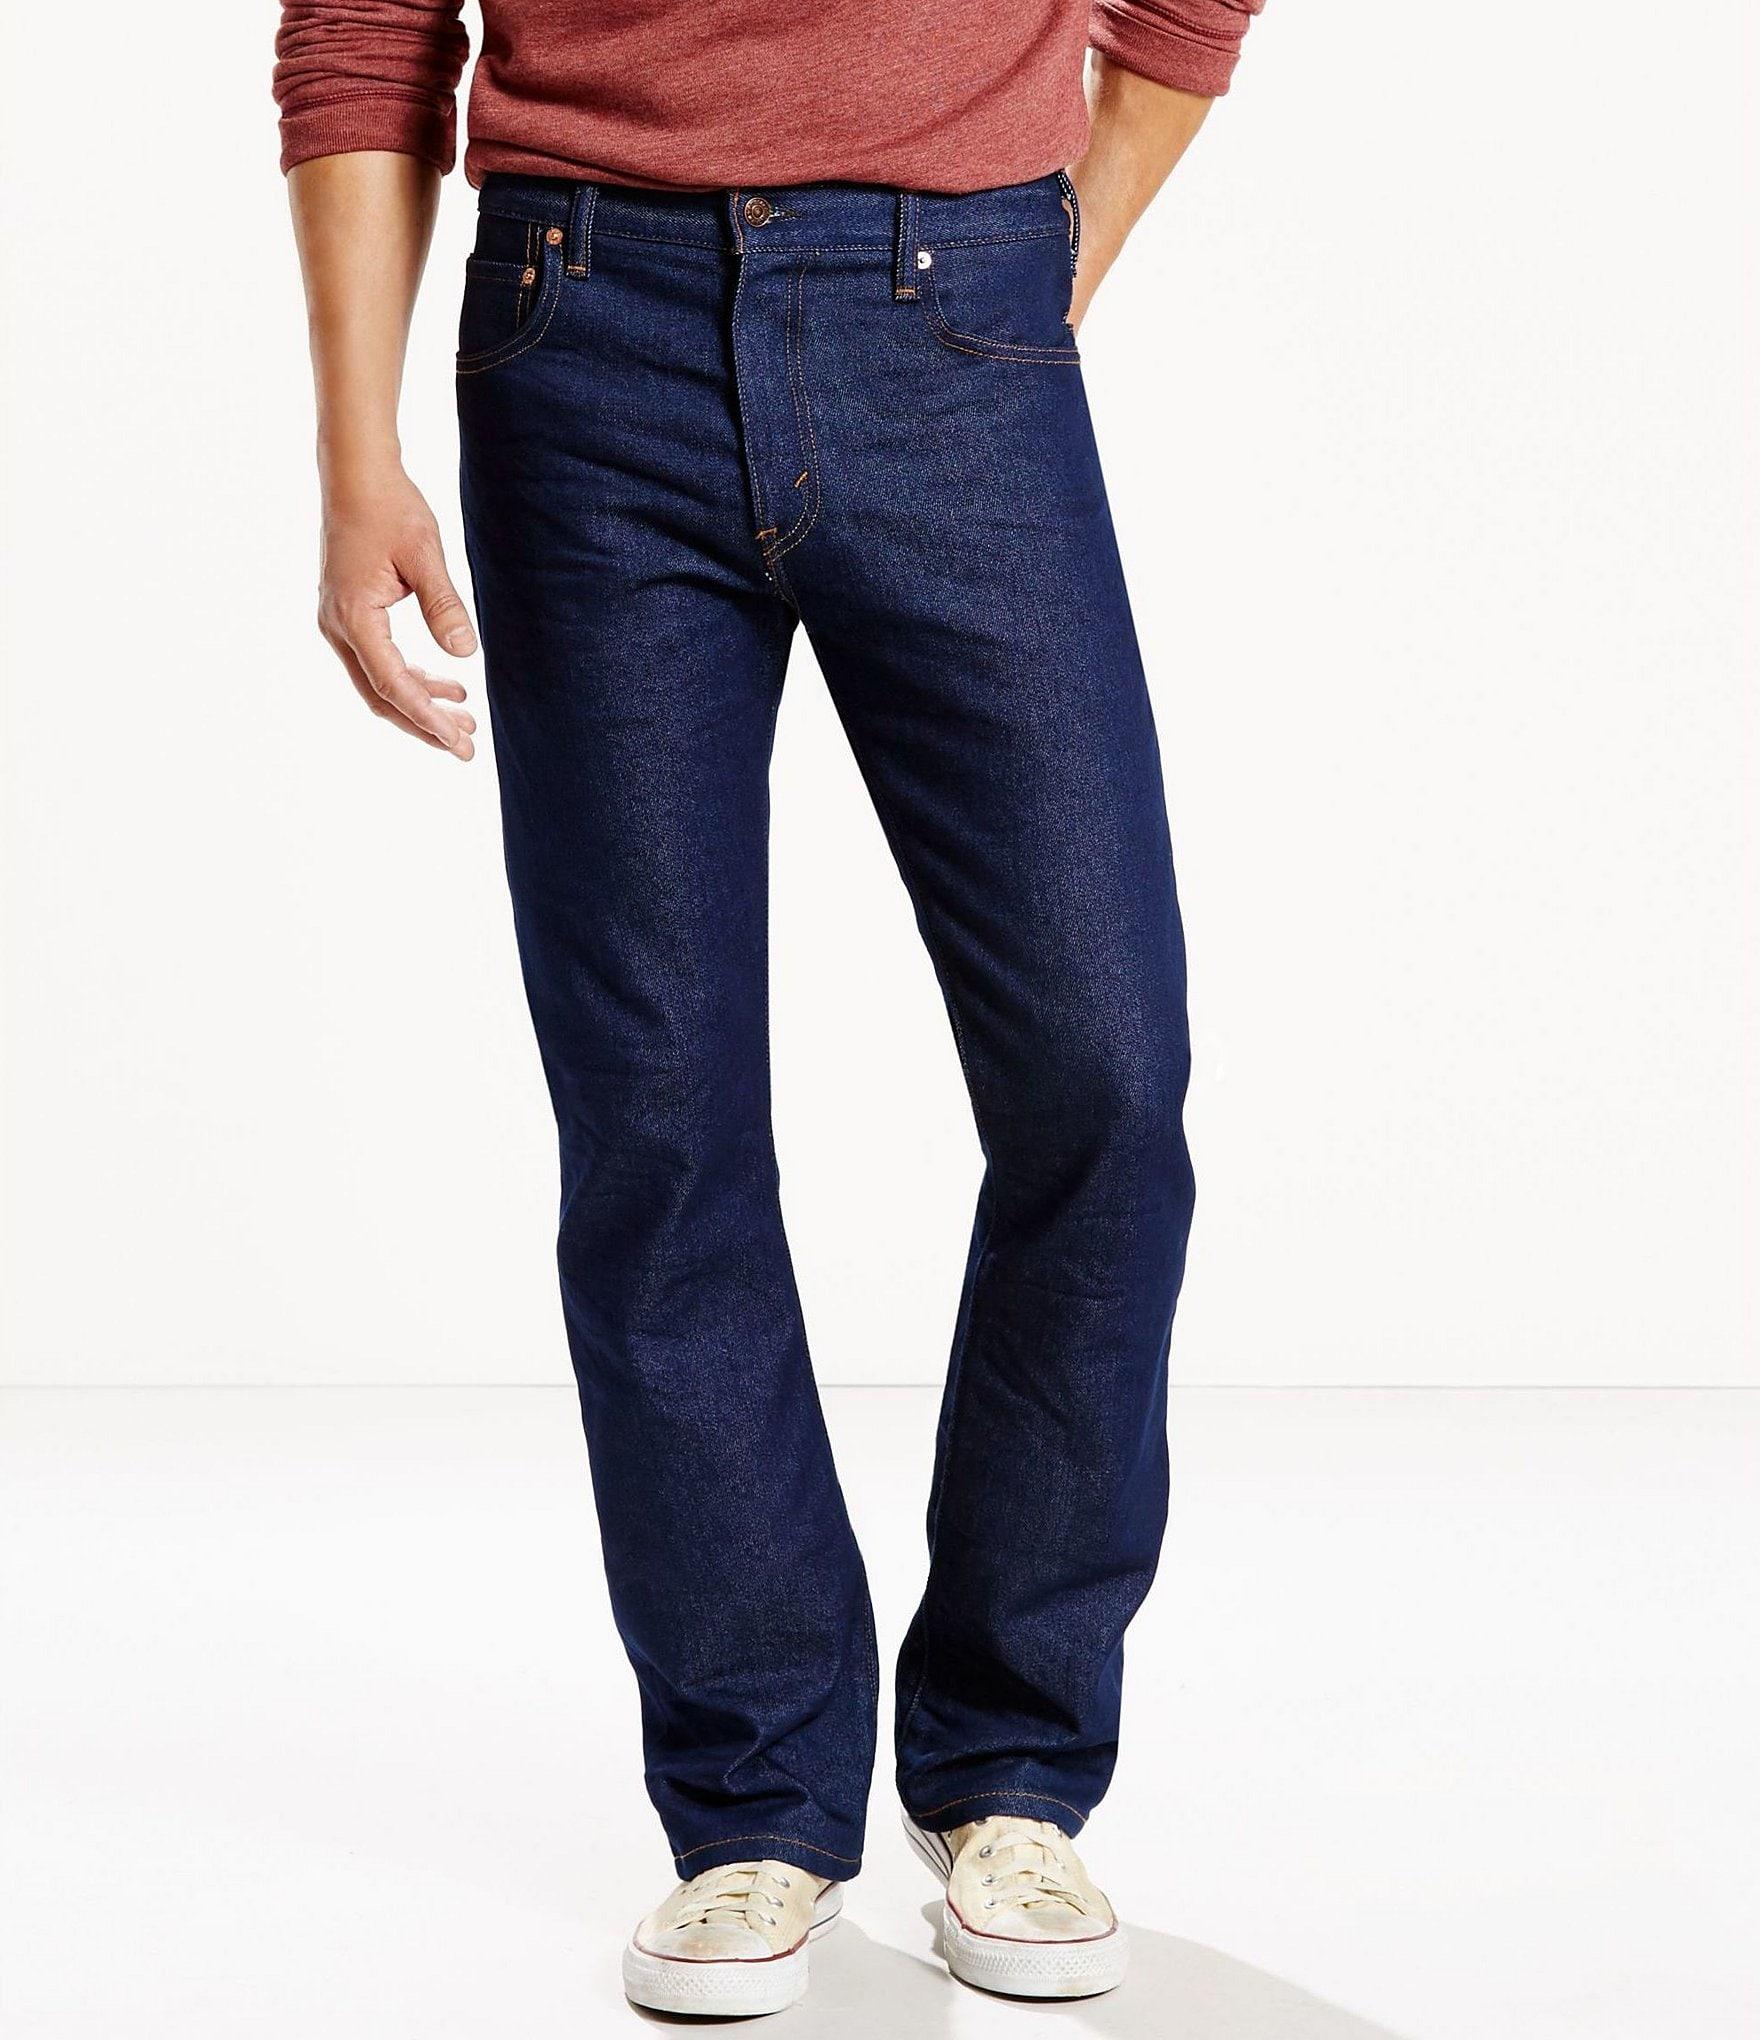 levi s 517 stretch bootcut jeans dillards. Black Bedroom Furniture Sets. Home Design Ideas